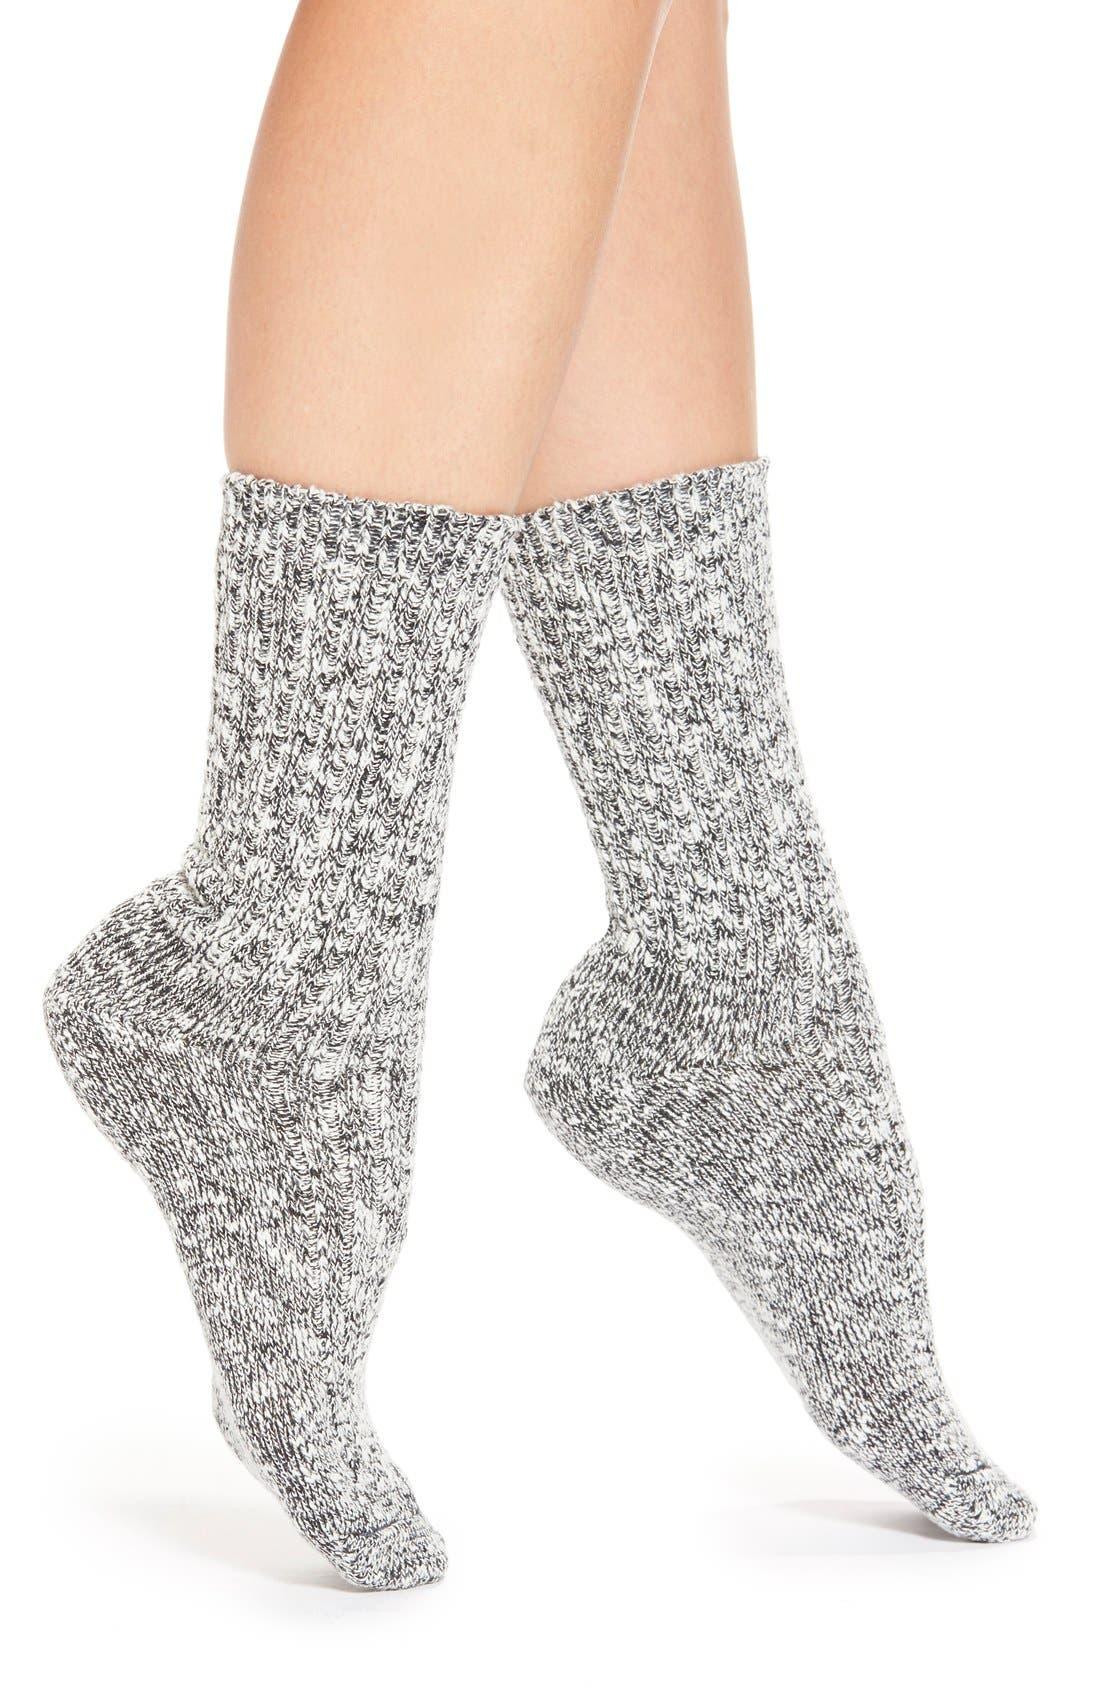 Main Image - Wigwam 'Cypress' Crew Socks